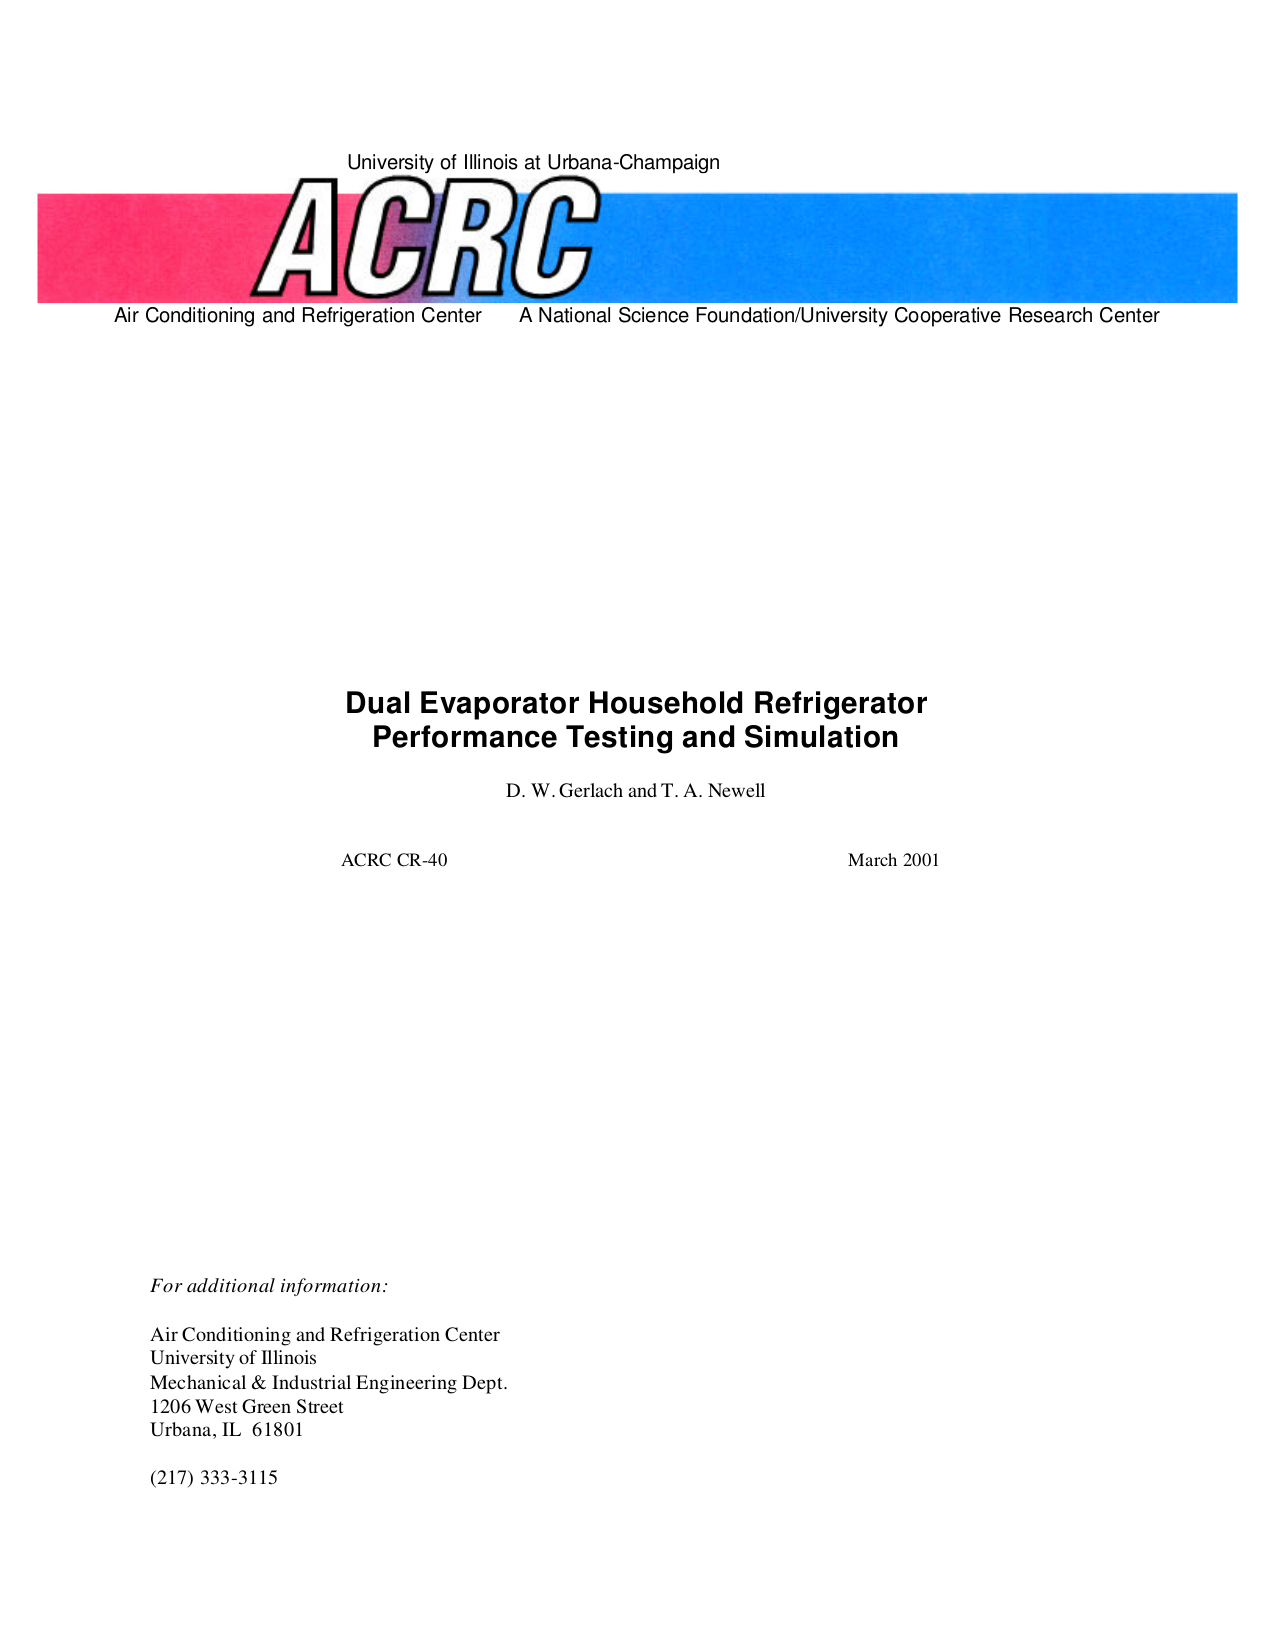 pdf for Hussmann Freezer LG manual